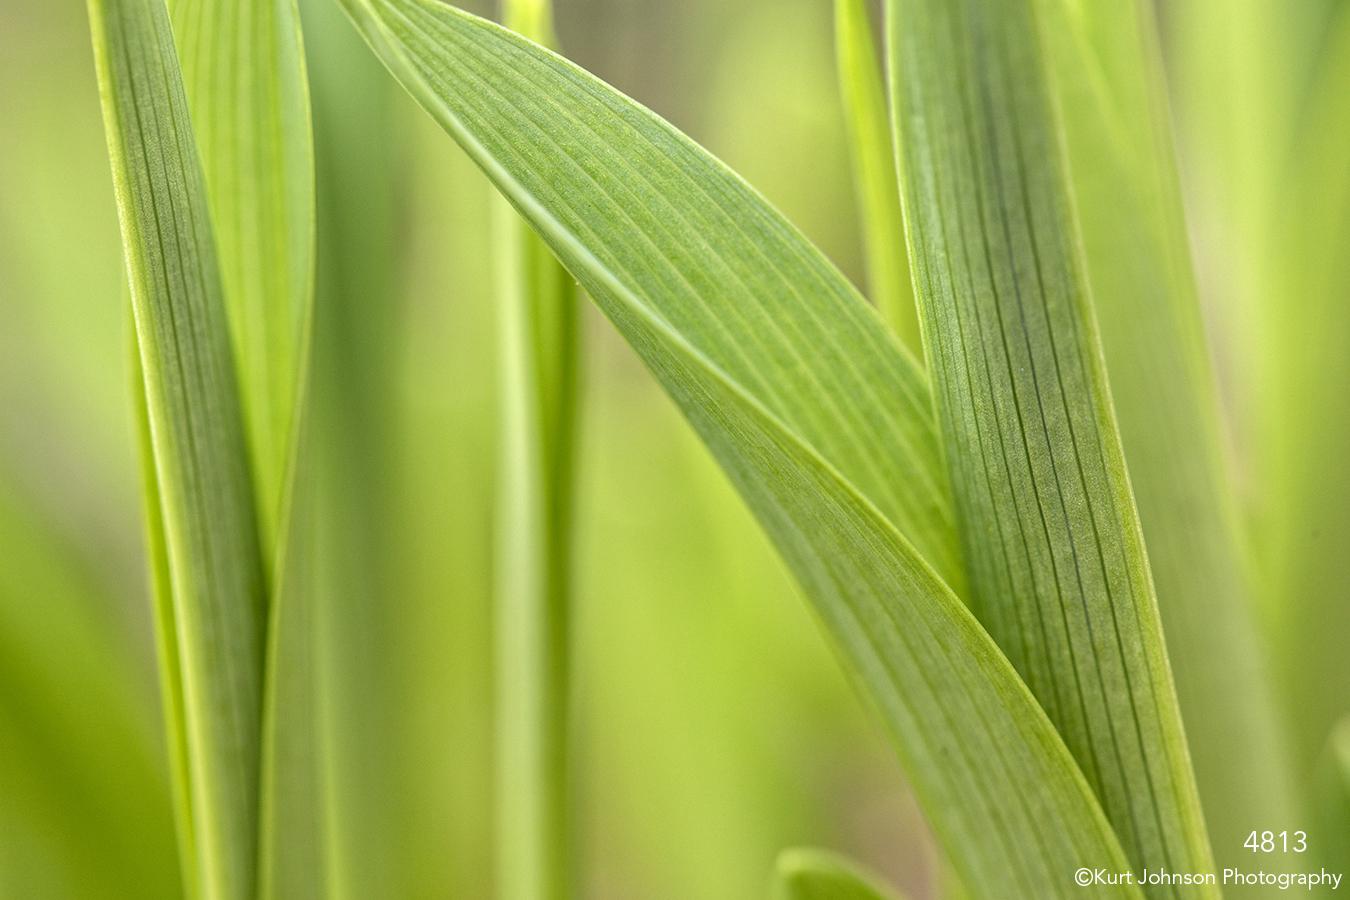 grasses green detail close up texture